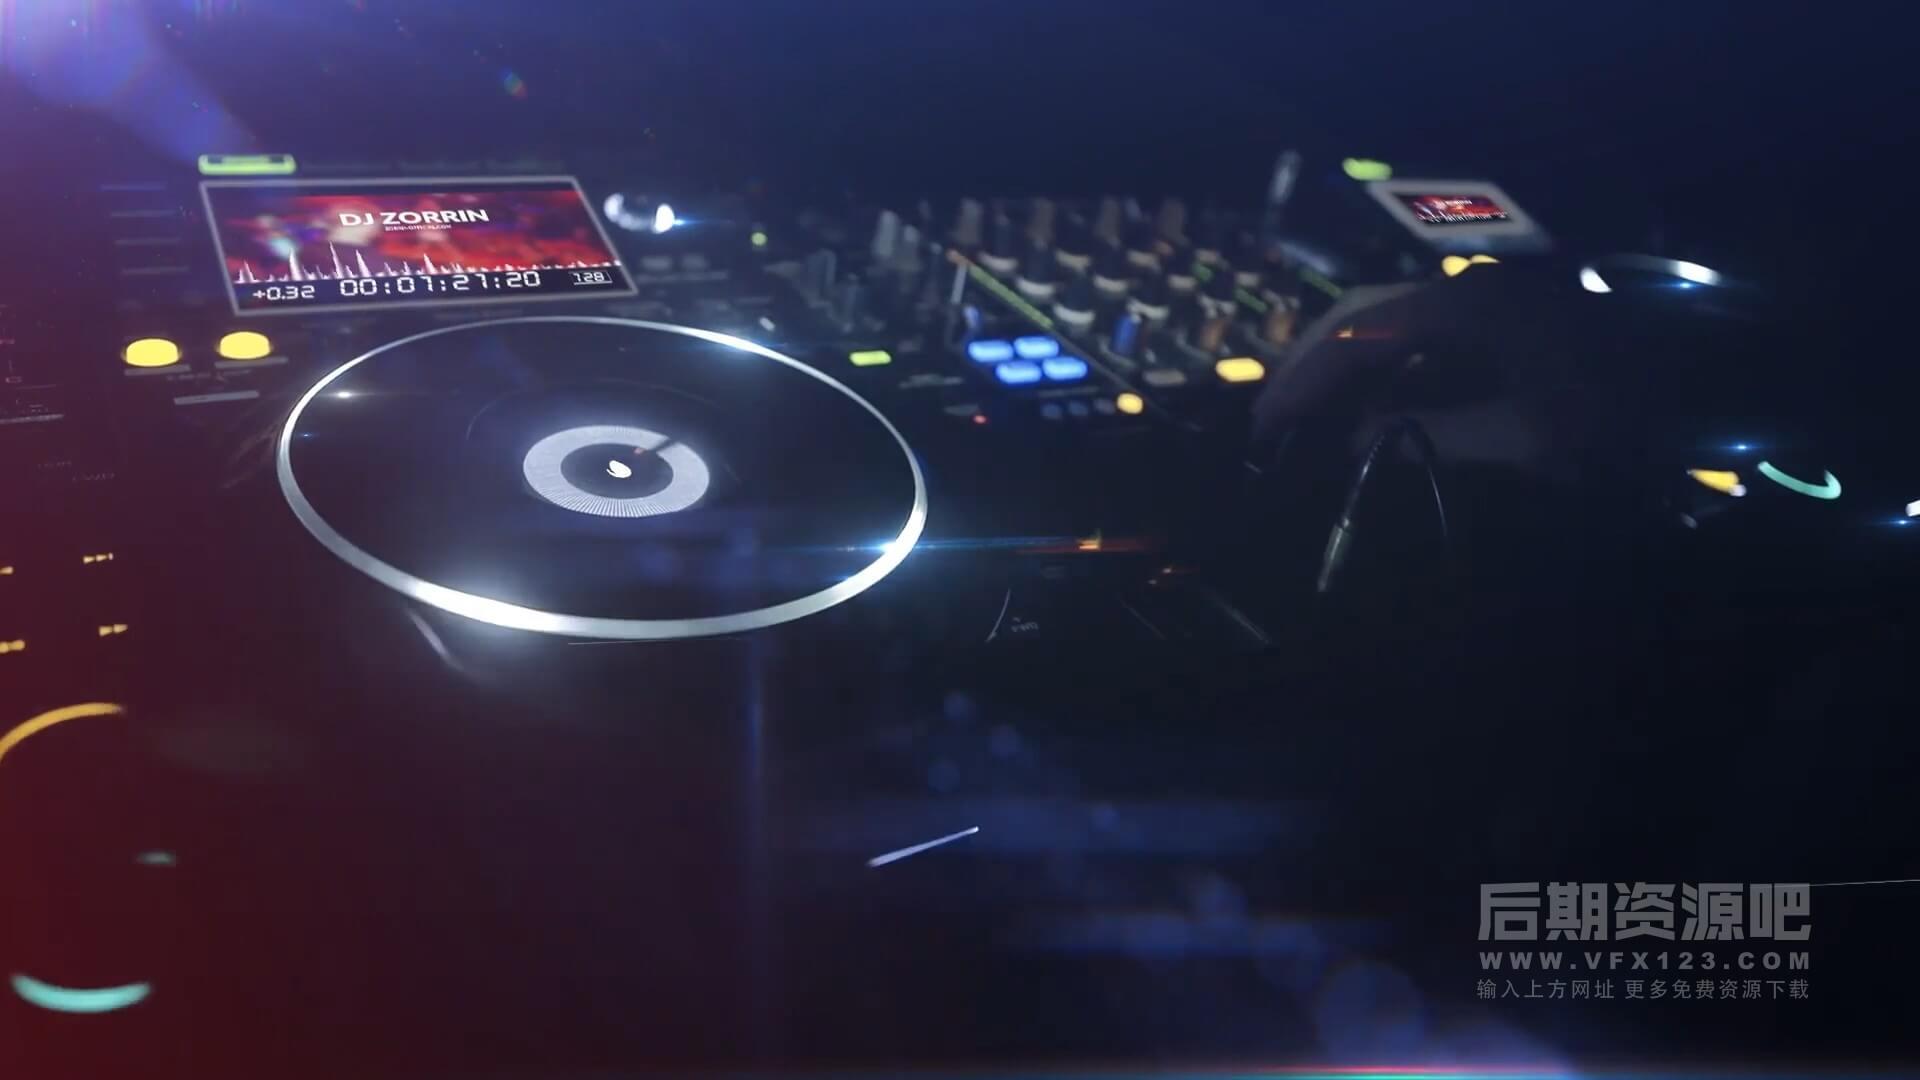 fcpx插件 DJ俱乐部迪厅夜总会lOGO徽标展示模板 DJ Night Club Logos